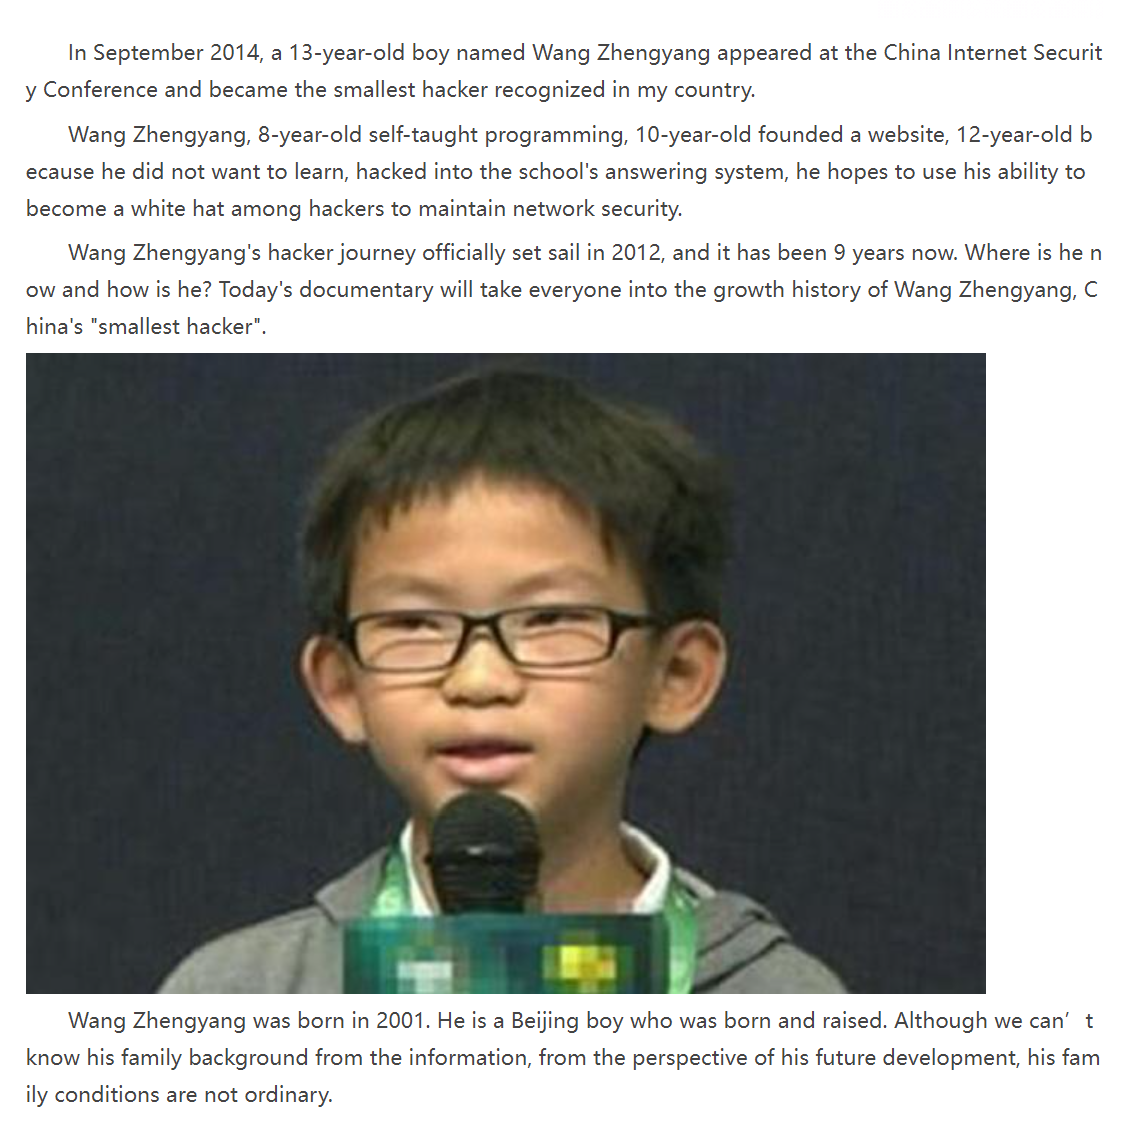 C:\Users\Dell-Vio\Desktop\05.10.2021\Wang Zhengyang.png